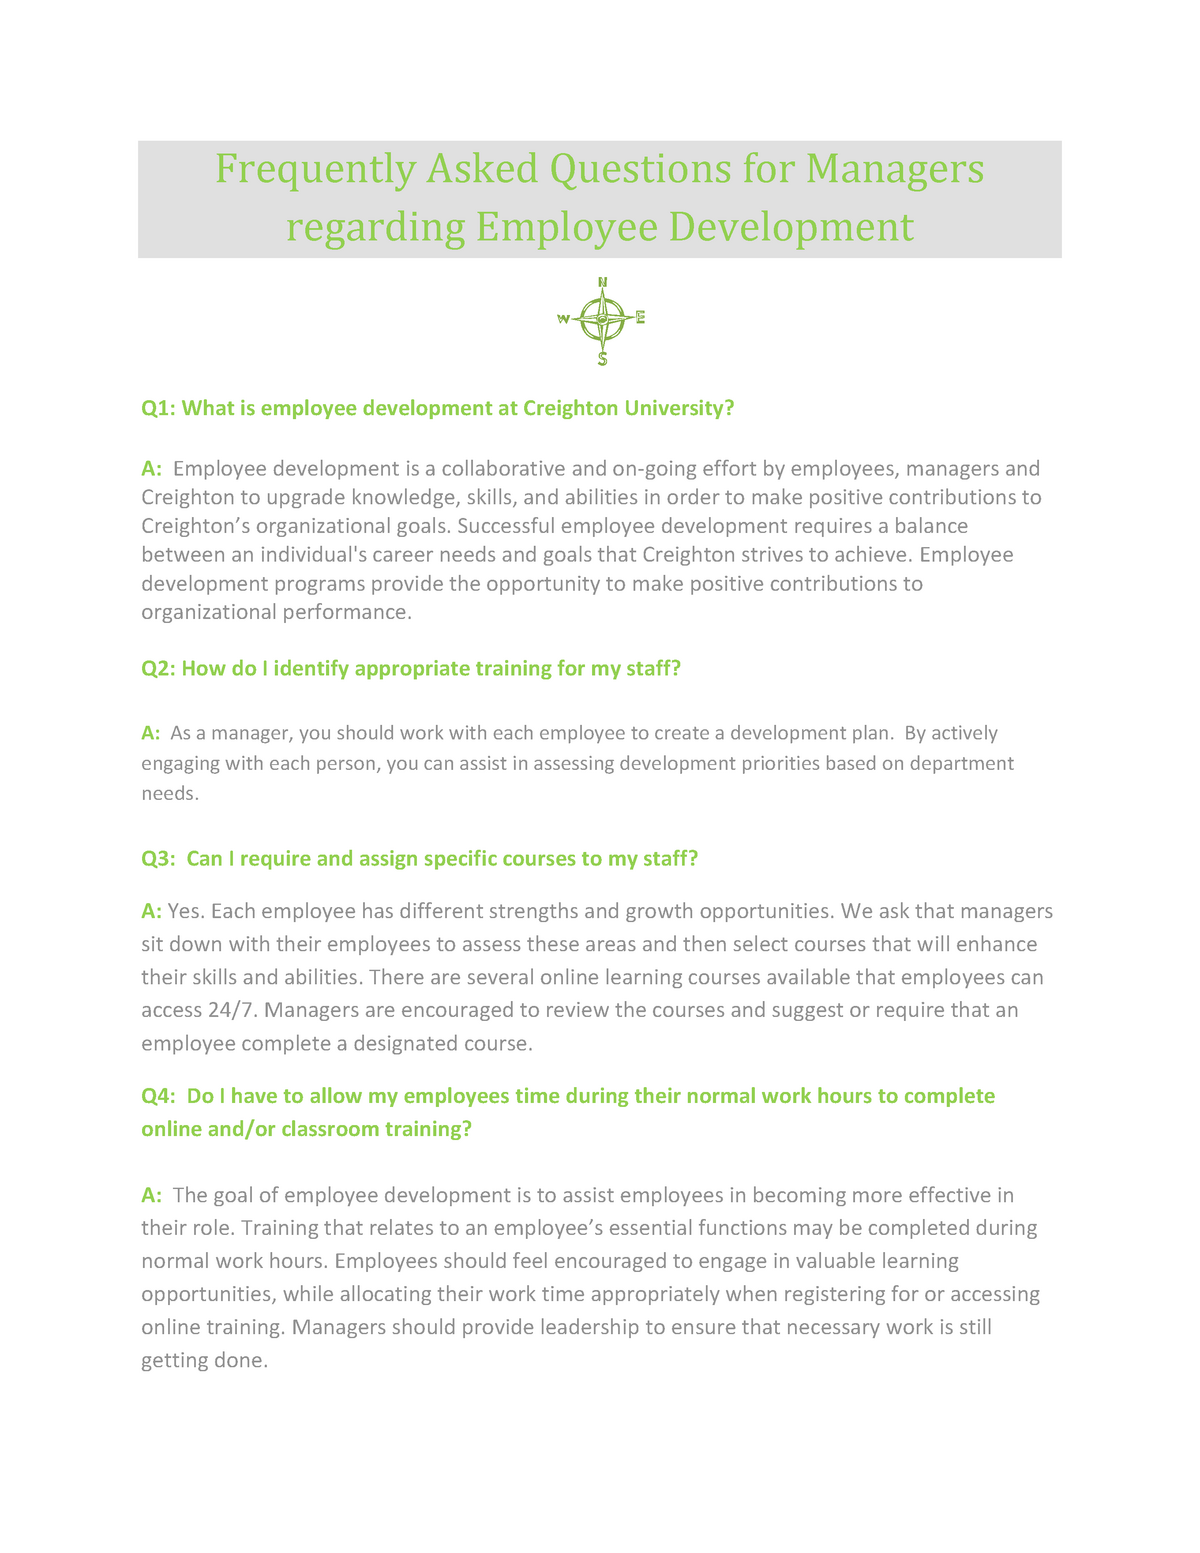 Practical - FAQ for Manager's Employee Development